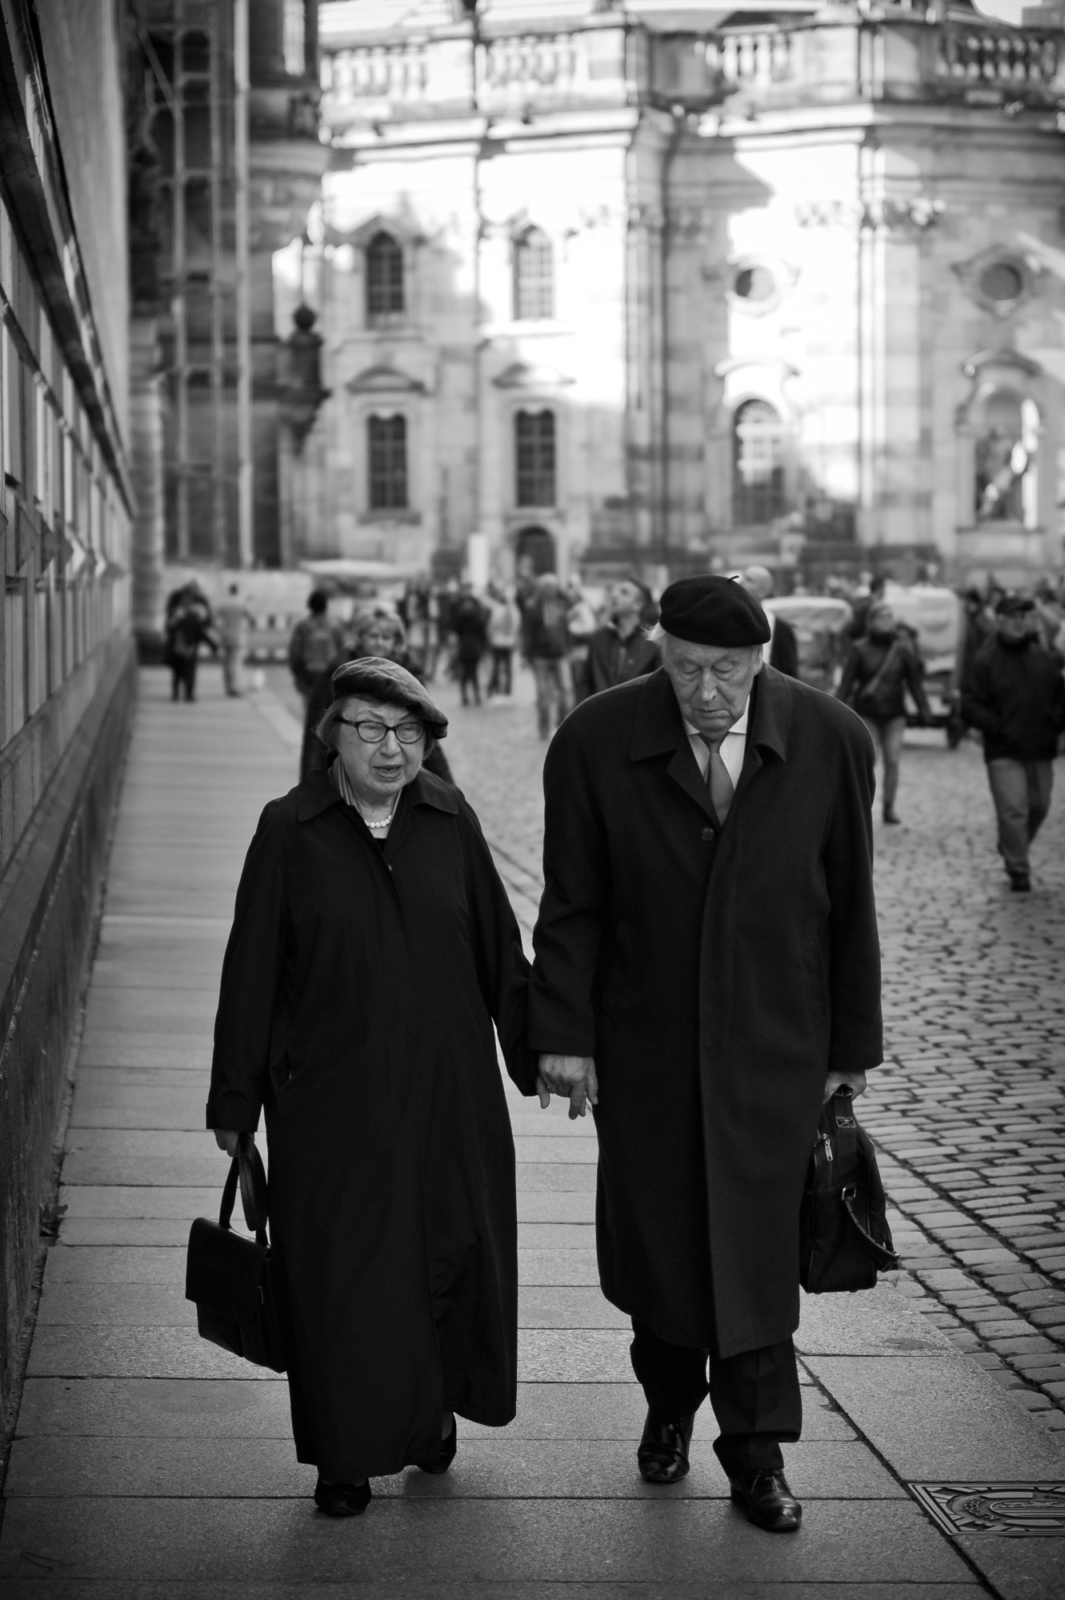 Älteres Ehepaar Händchen haltend in der Dresdener Innenstadt